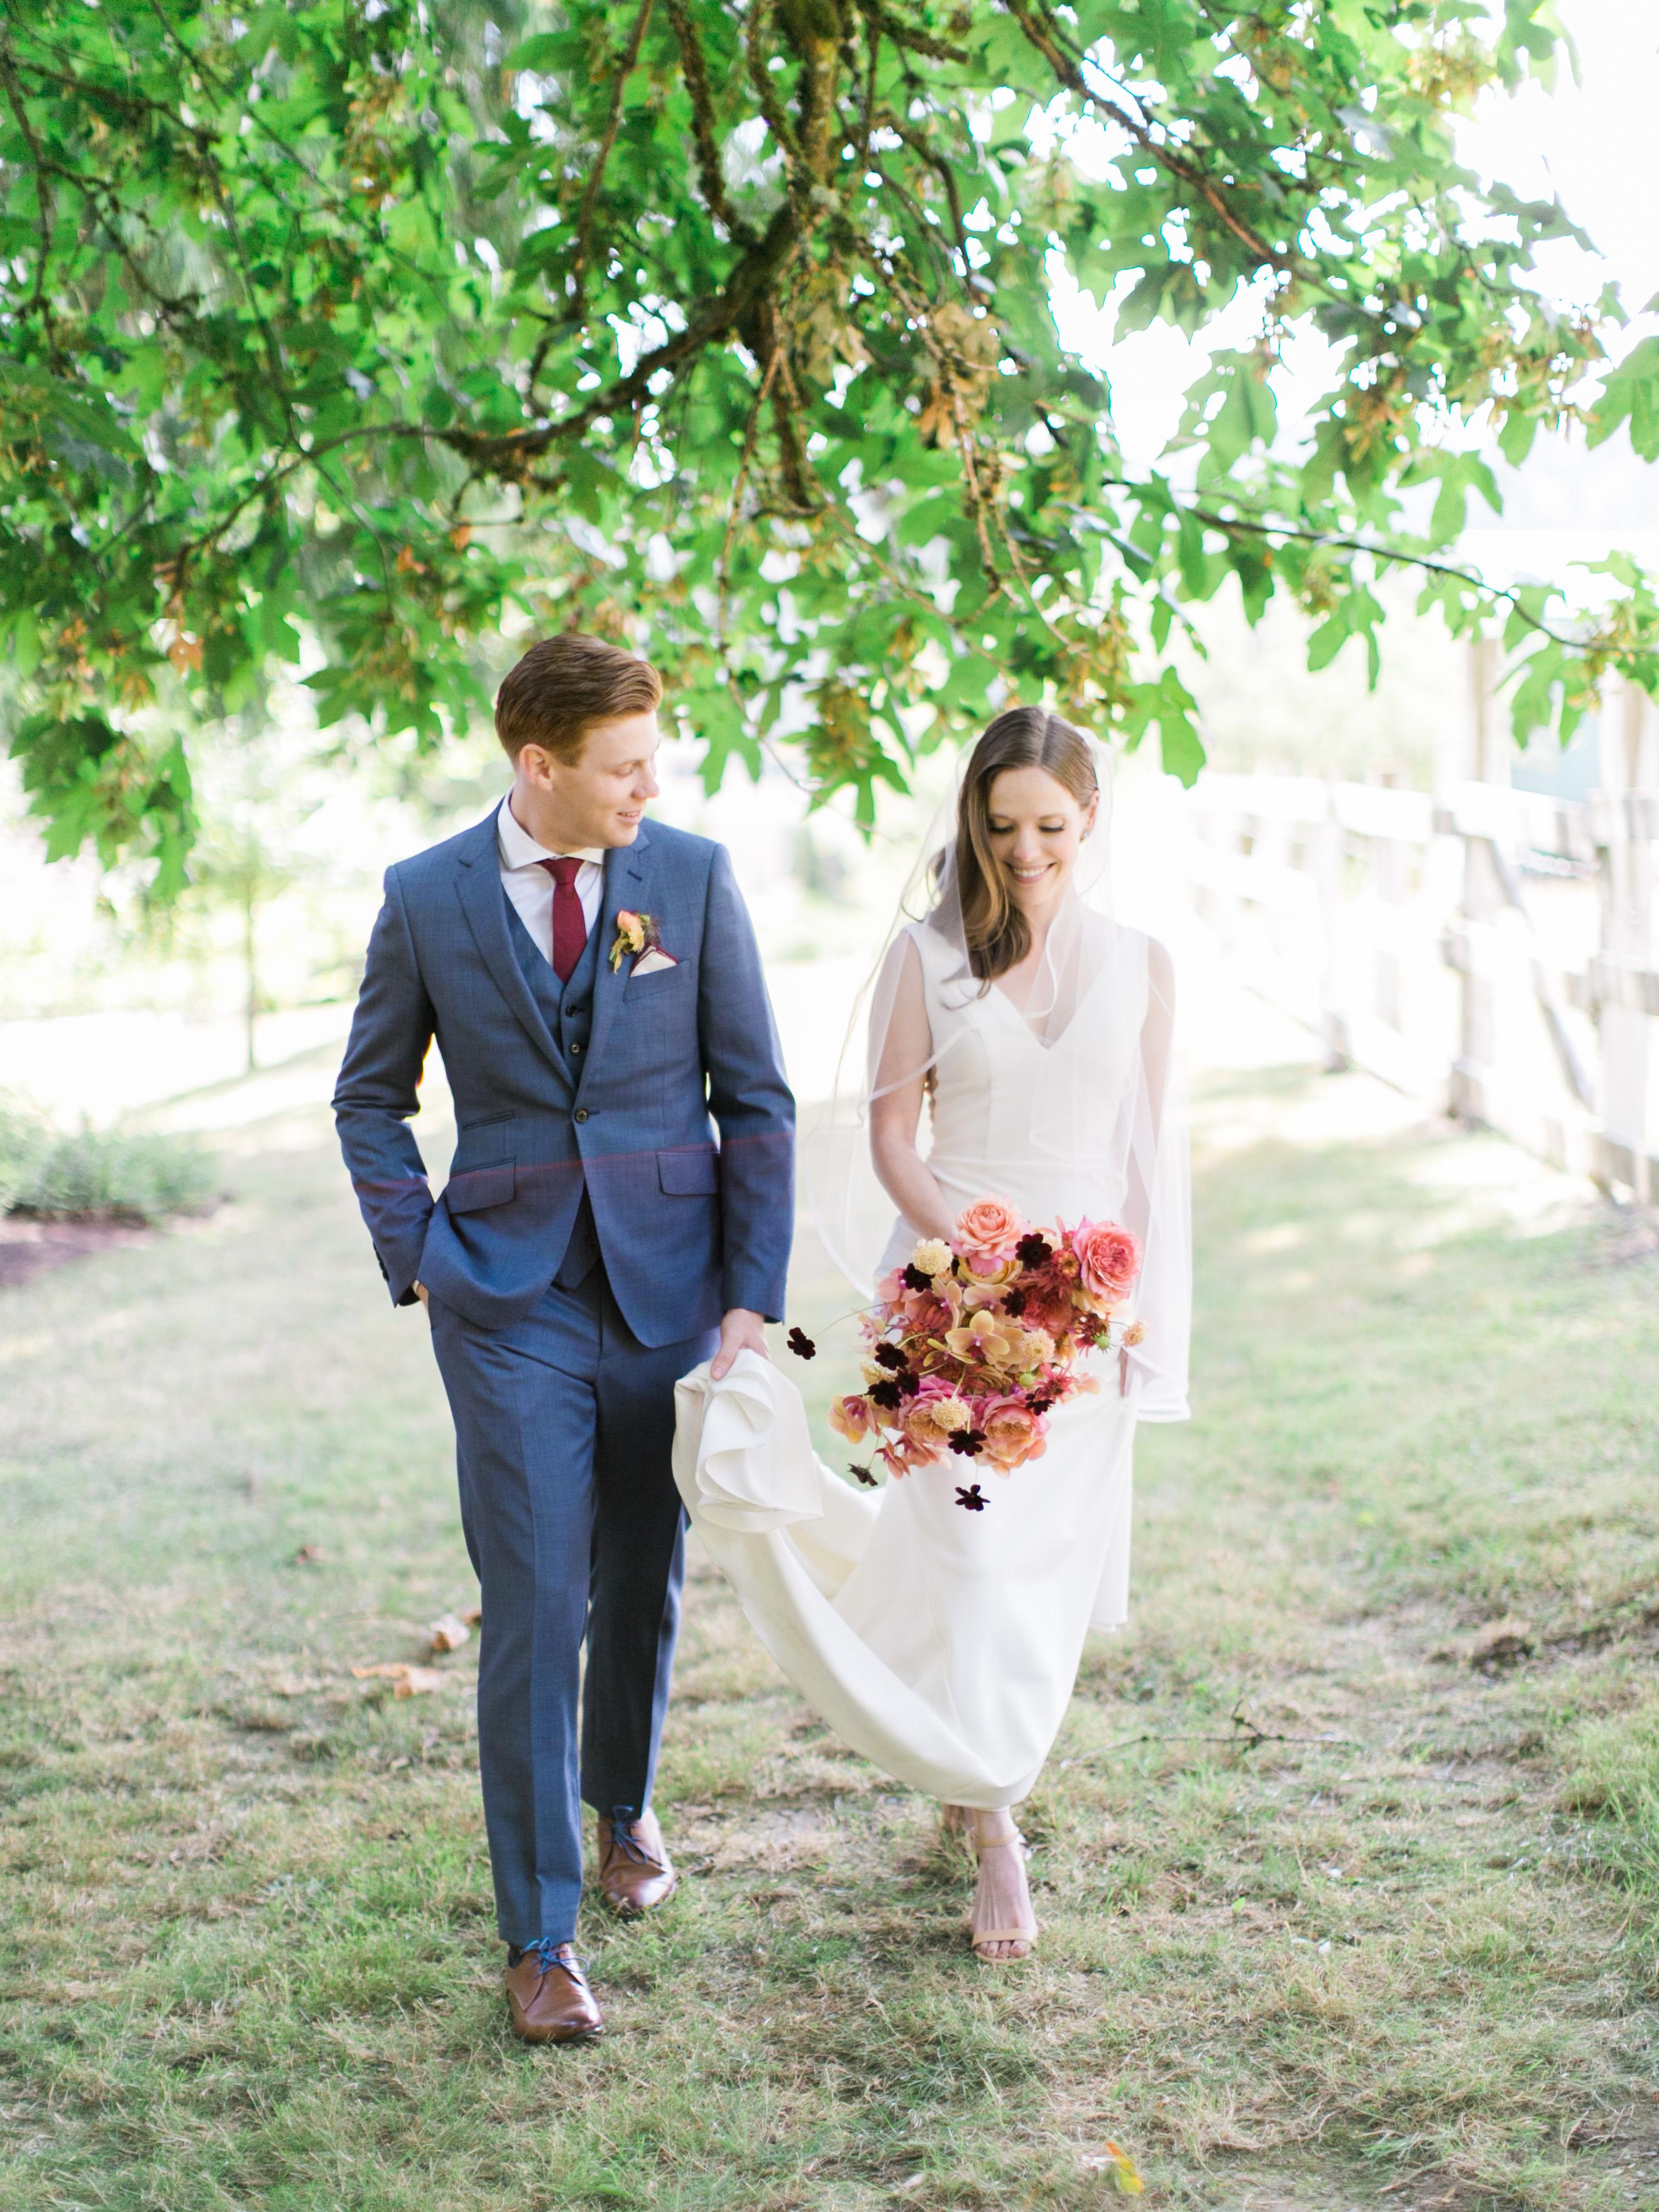 A Flower-Focused Washington Wedding at an Artisan Winery